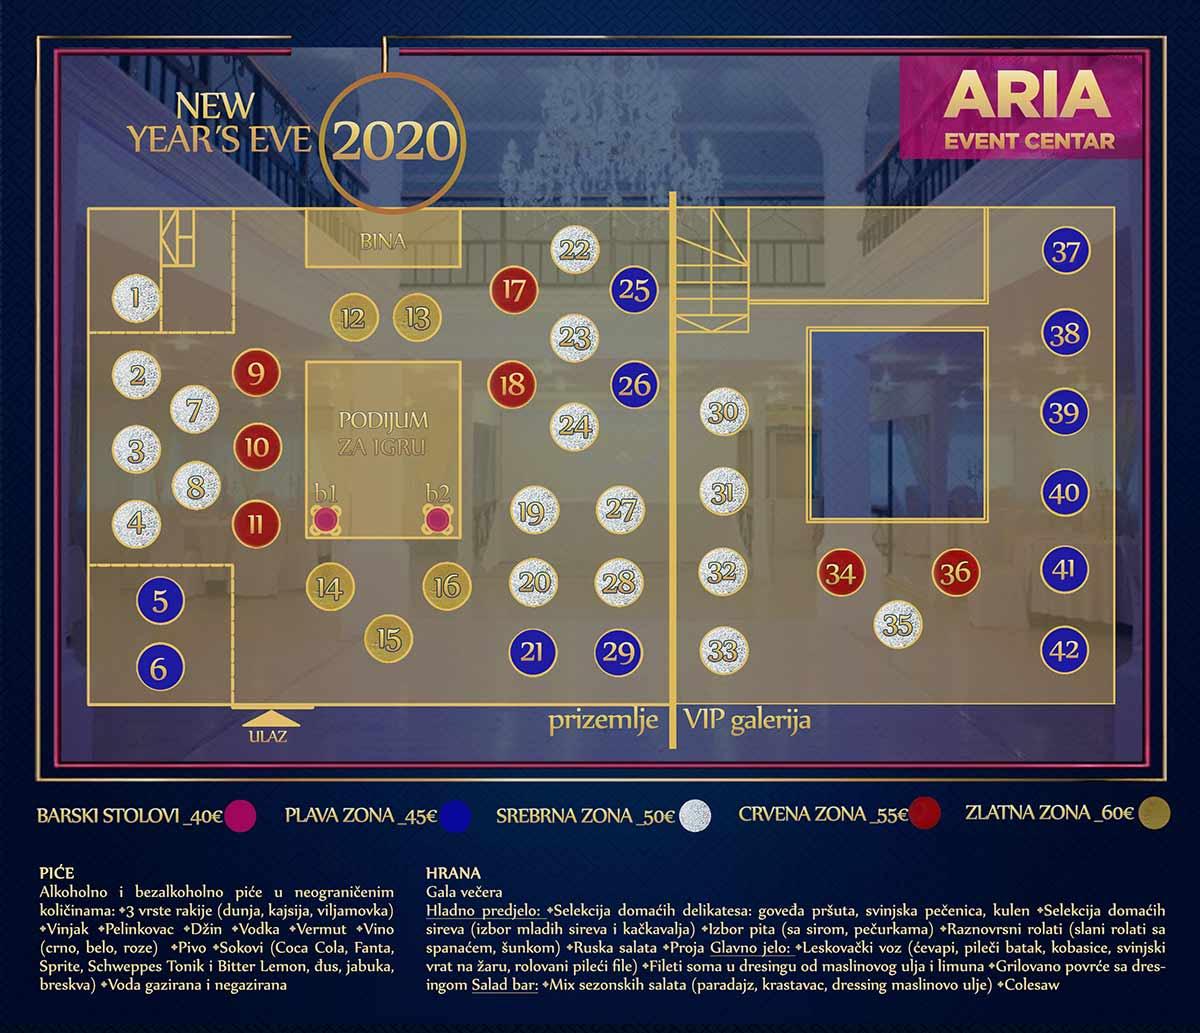 event centar aria nova godina mapa sedenja